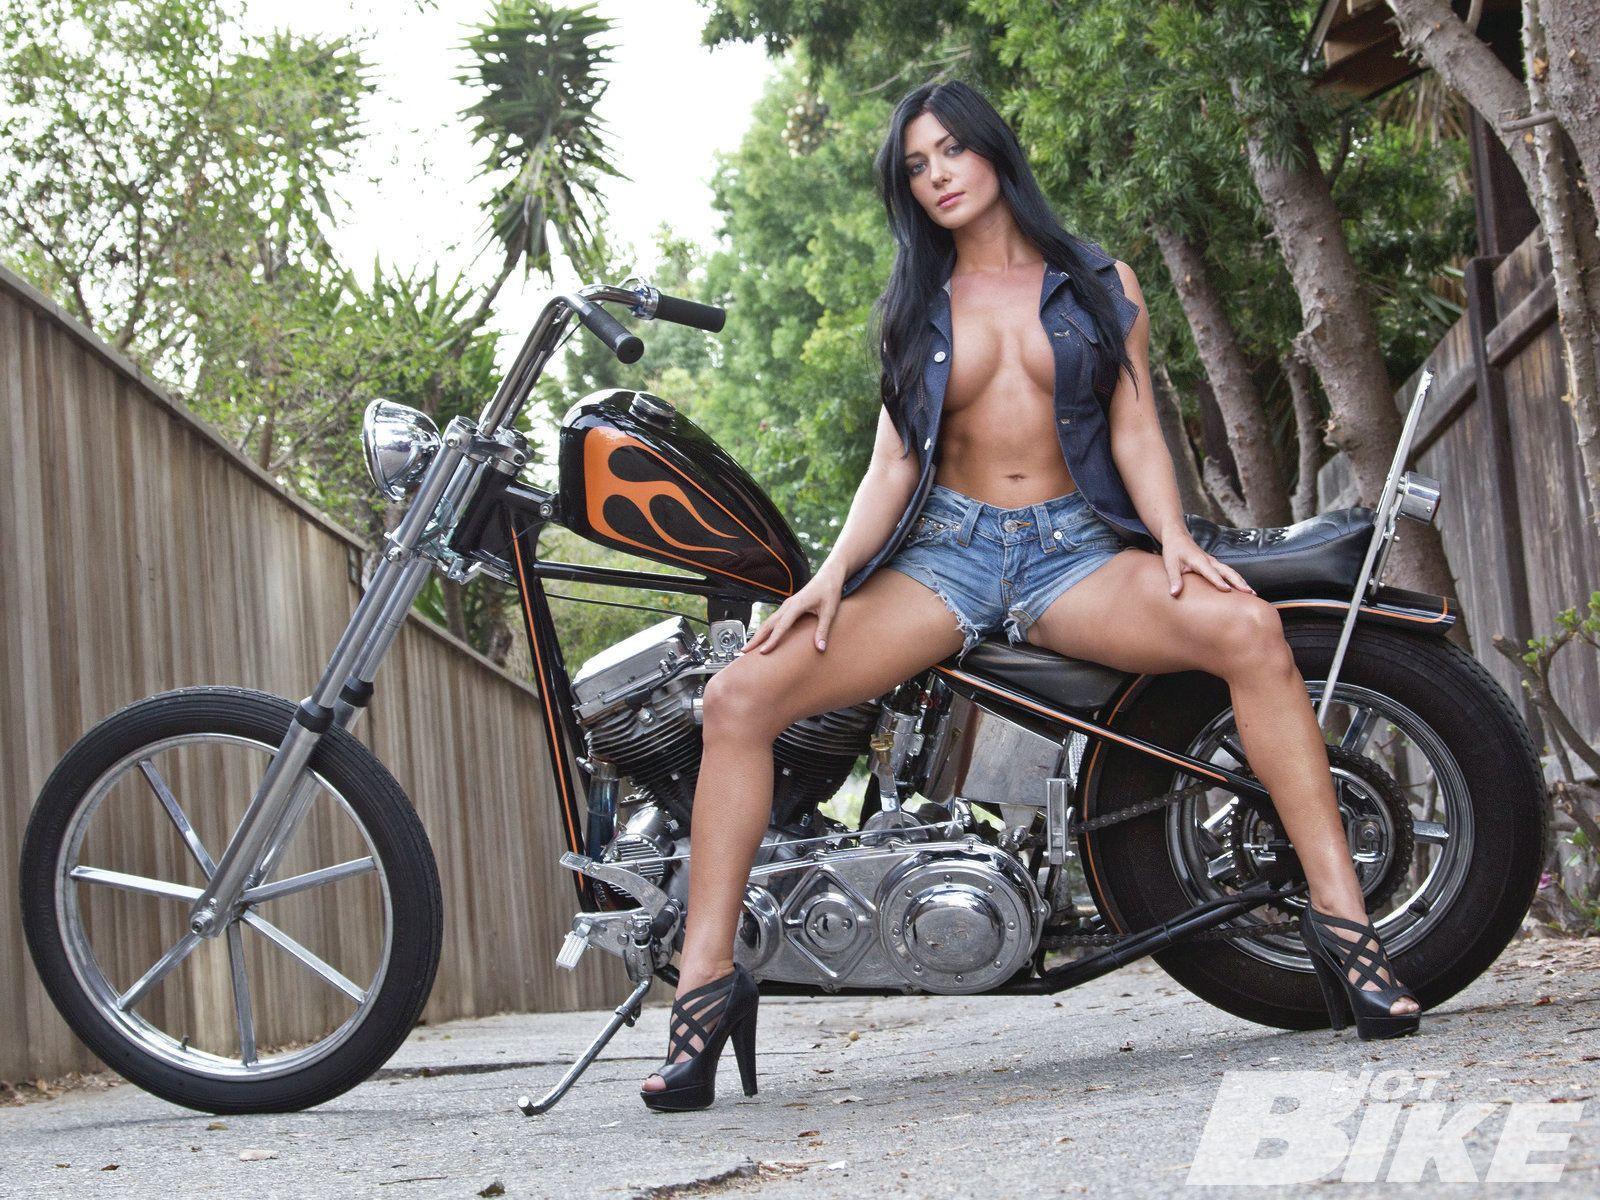 Nude girl on custom sport bike fast sexy